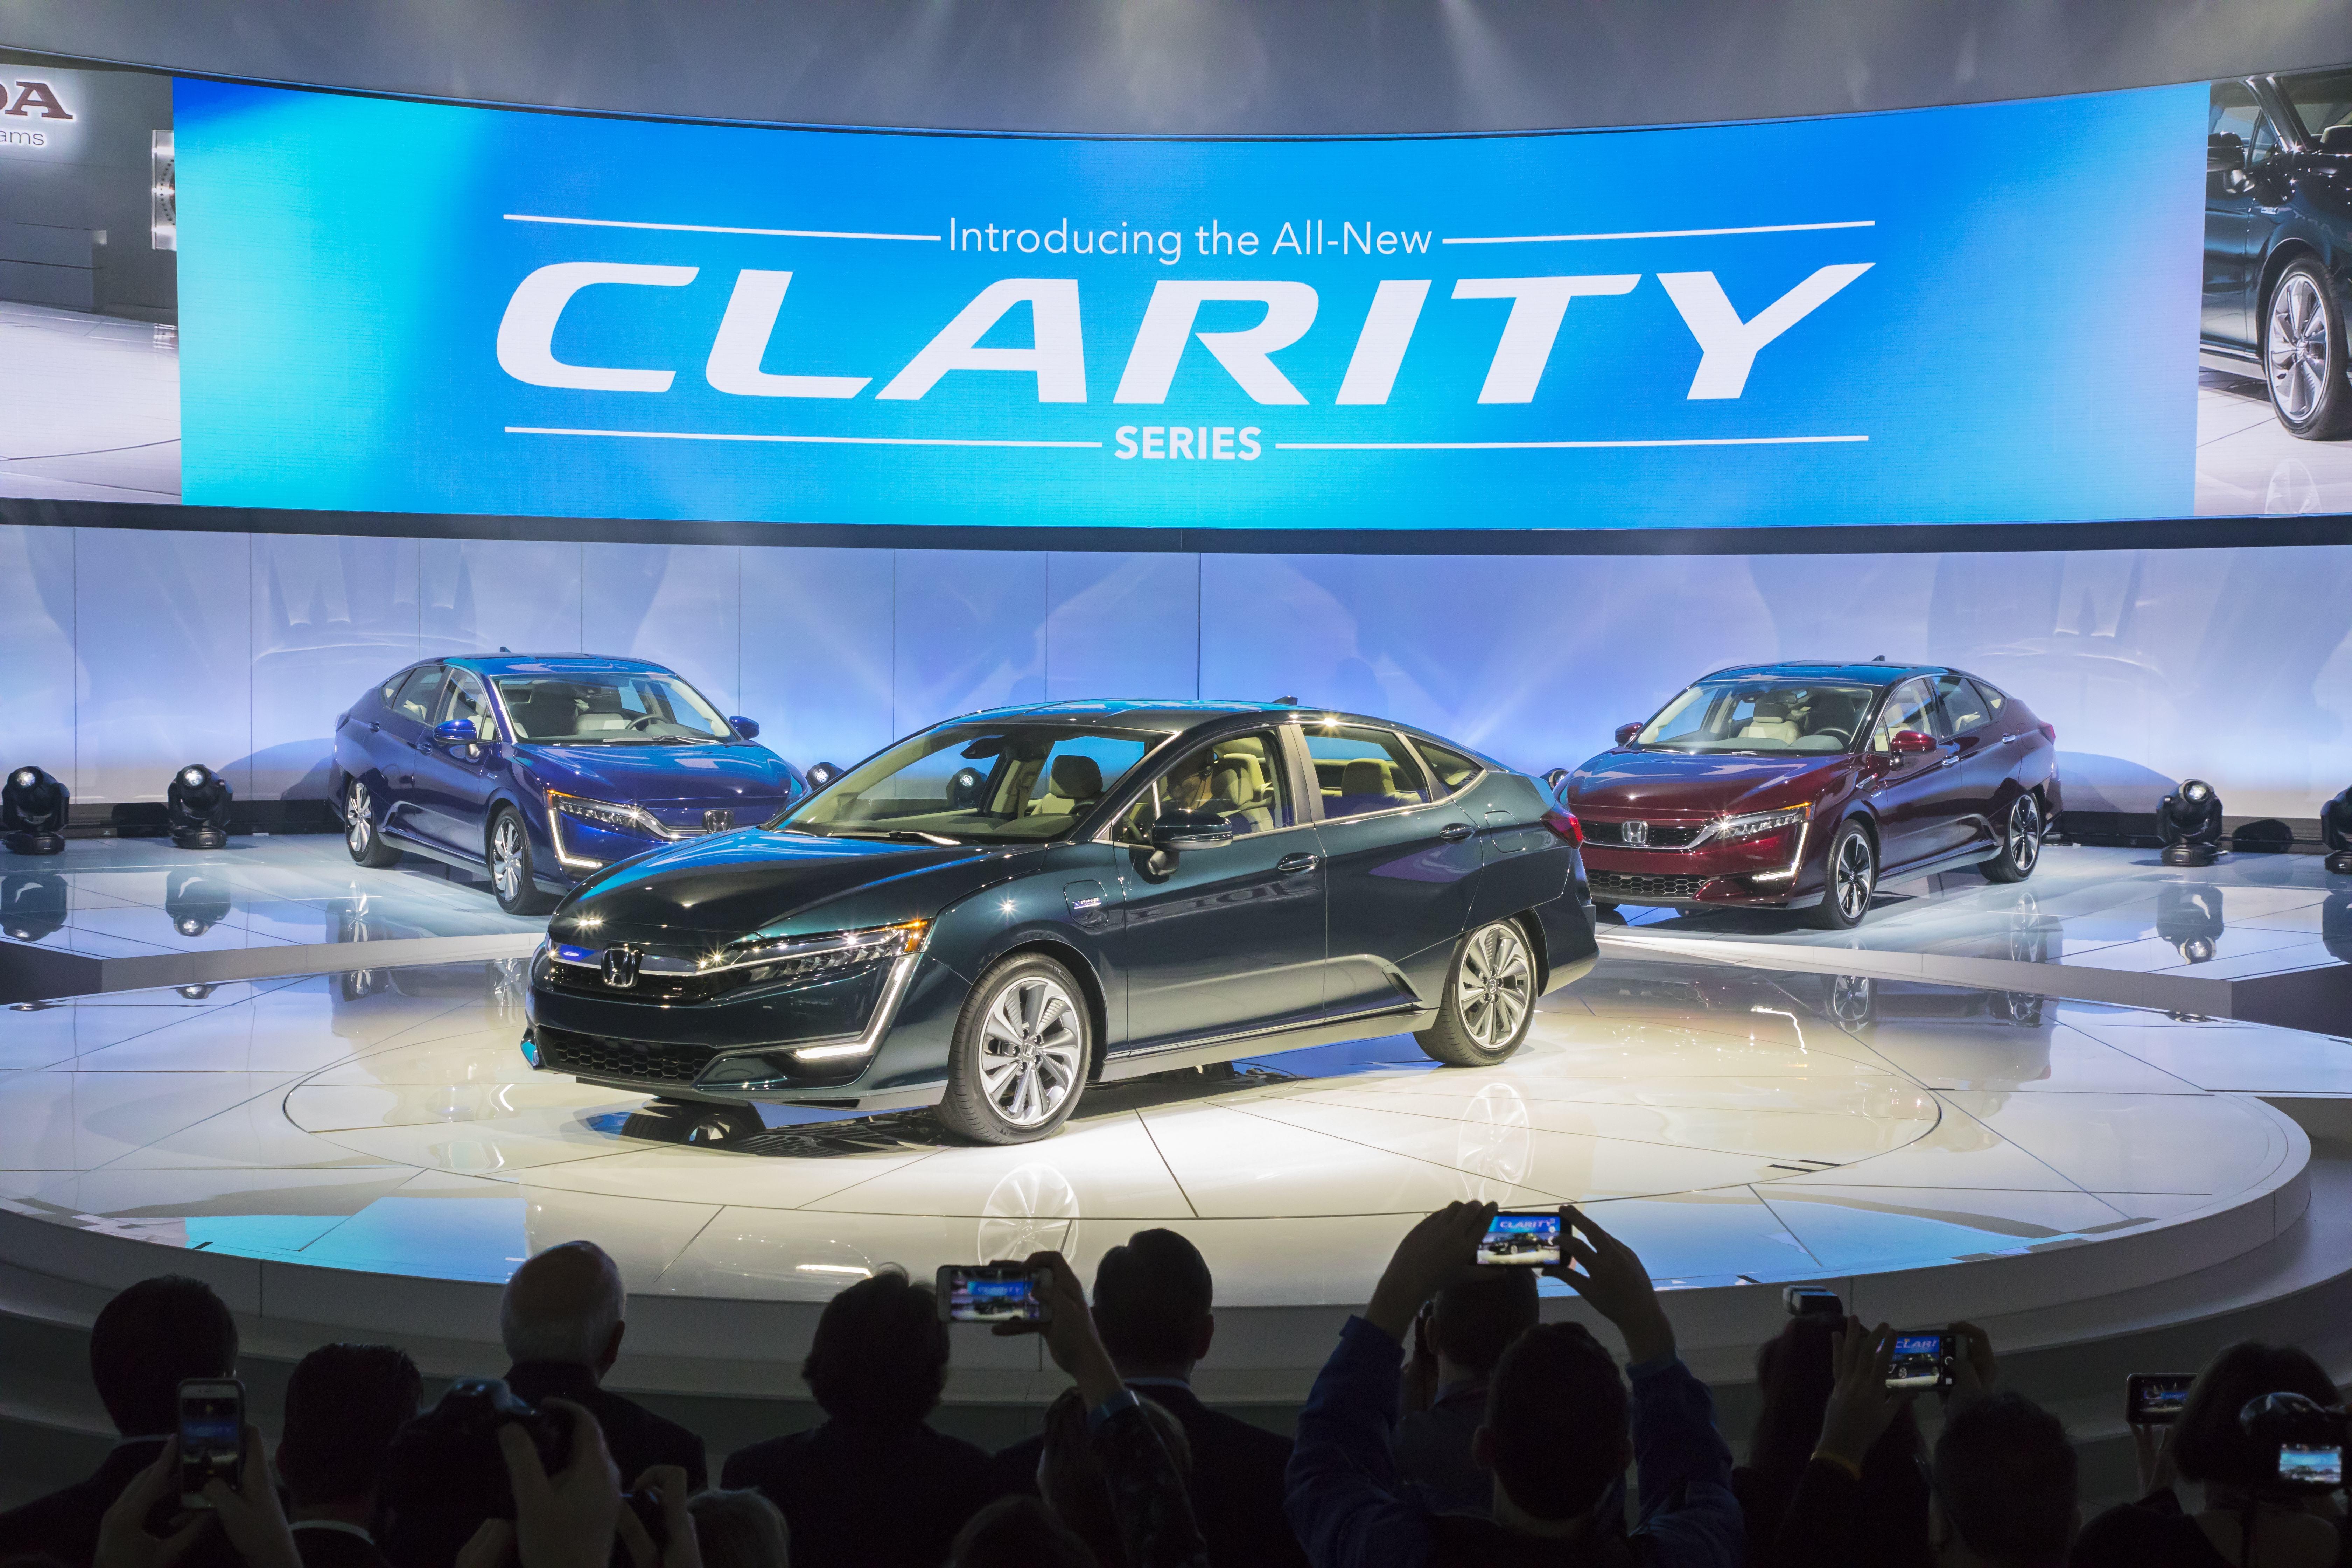 The 3 Honda Clarity sedans on display at the New York International Auto Show.